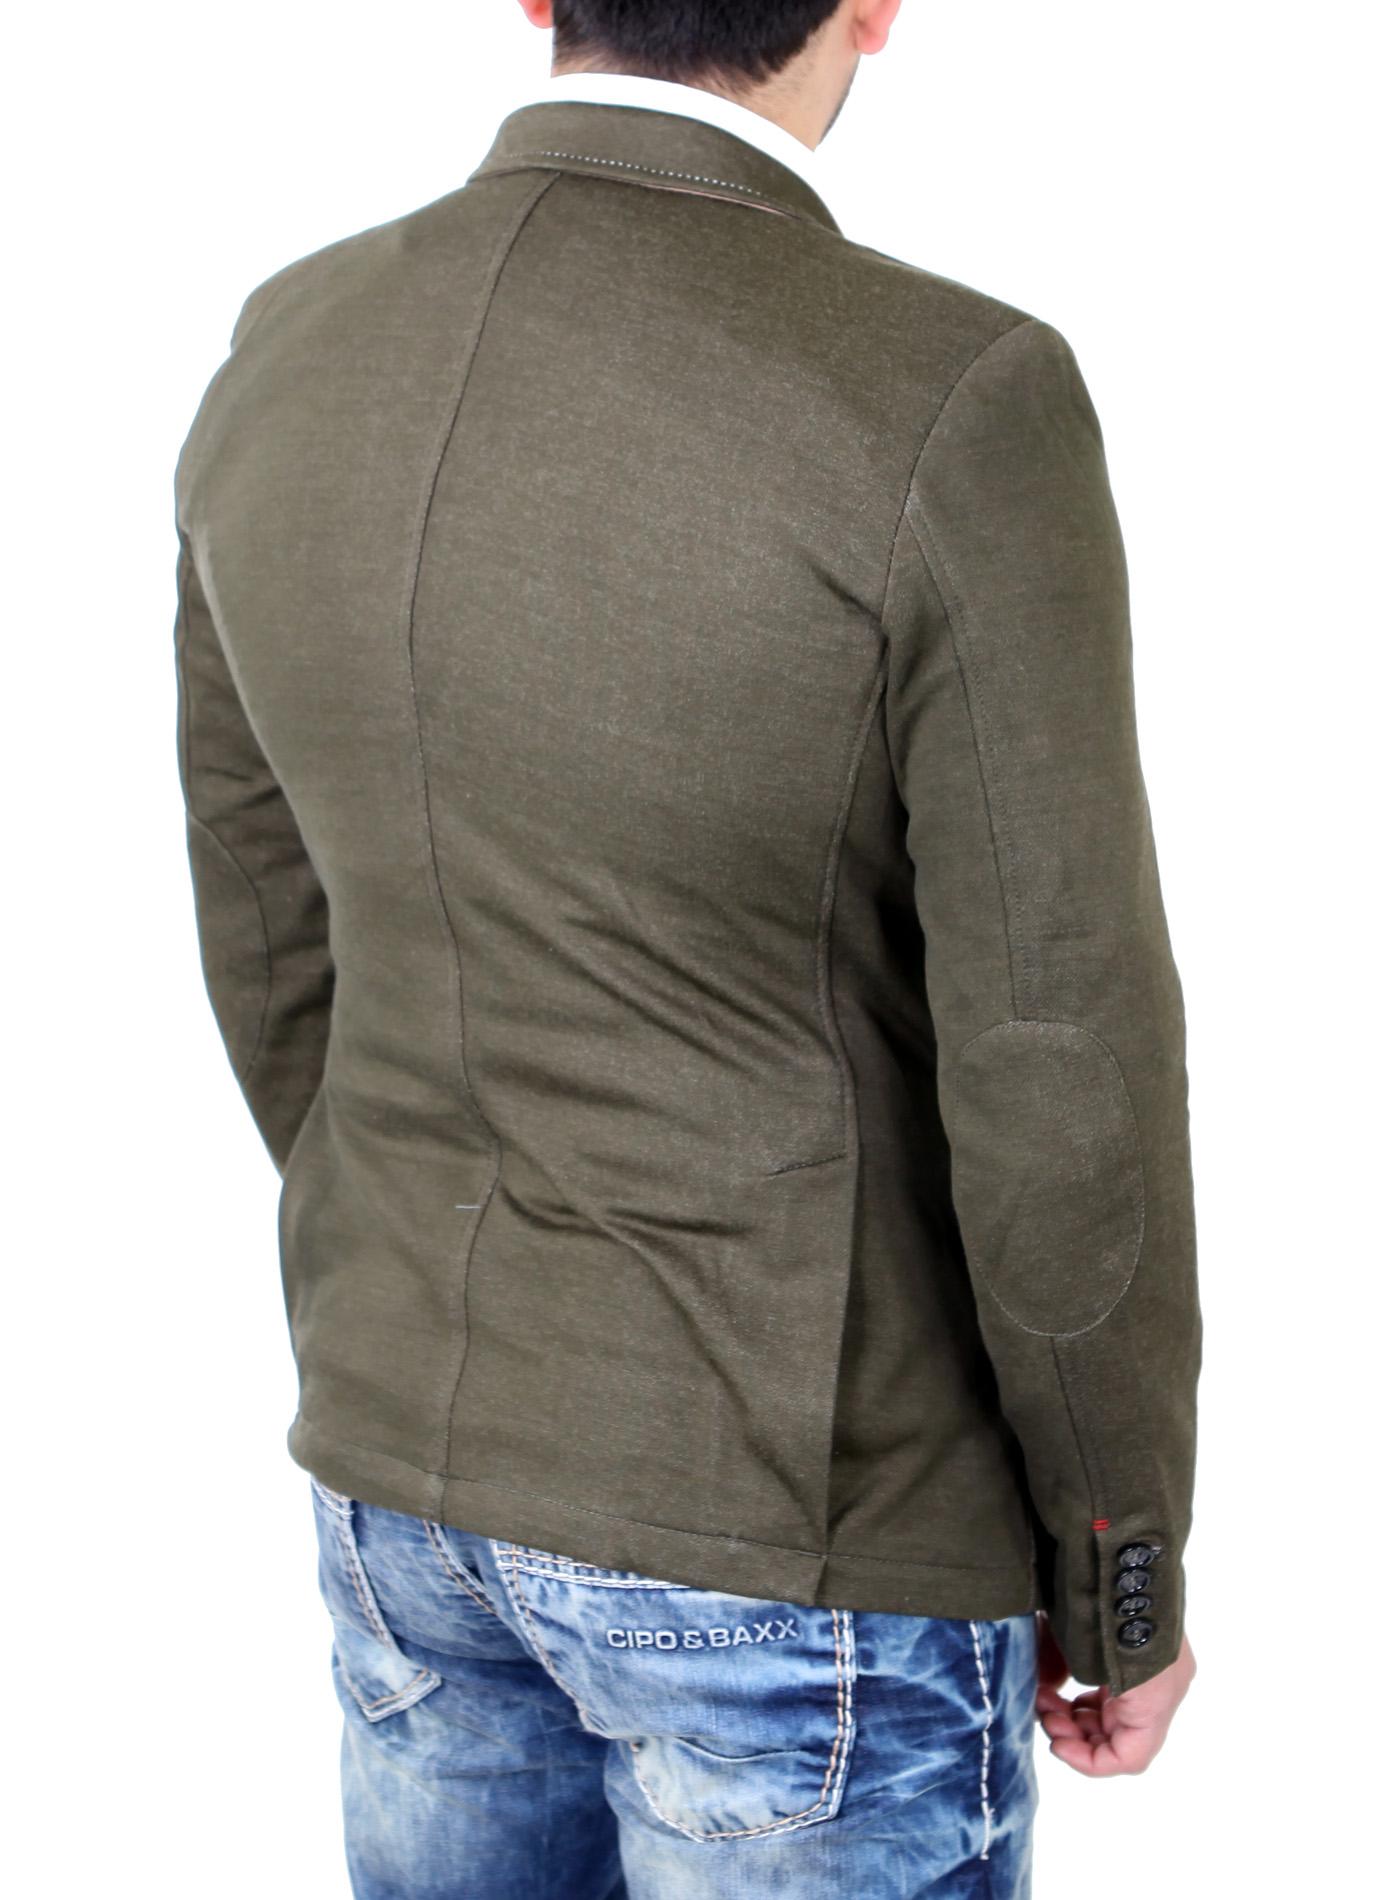 reslad herren sakko casual style stoff look blazer rs 8400 neu ebay. Black Bedroom Furniture Sets. Home Design Ideas